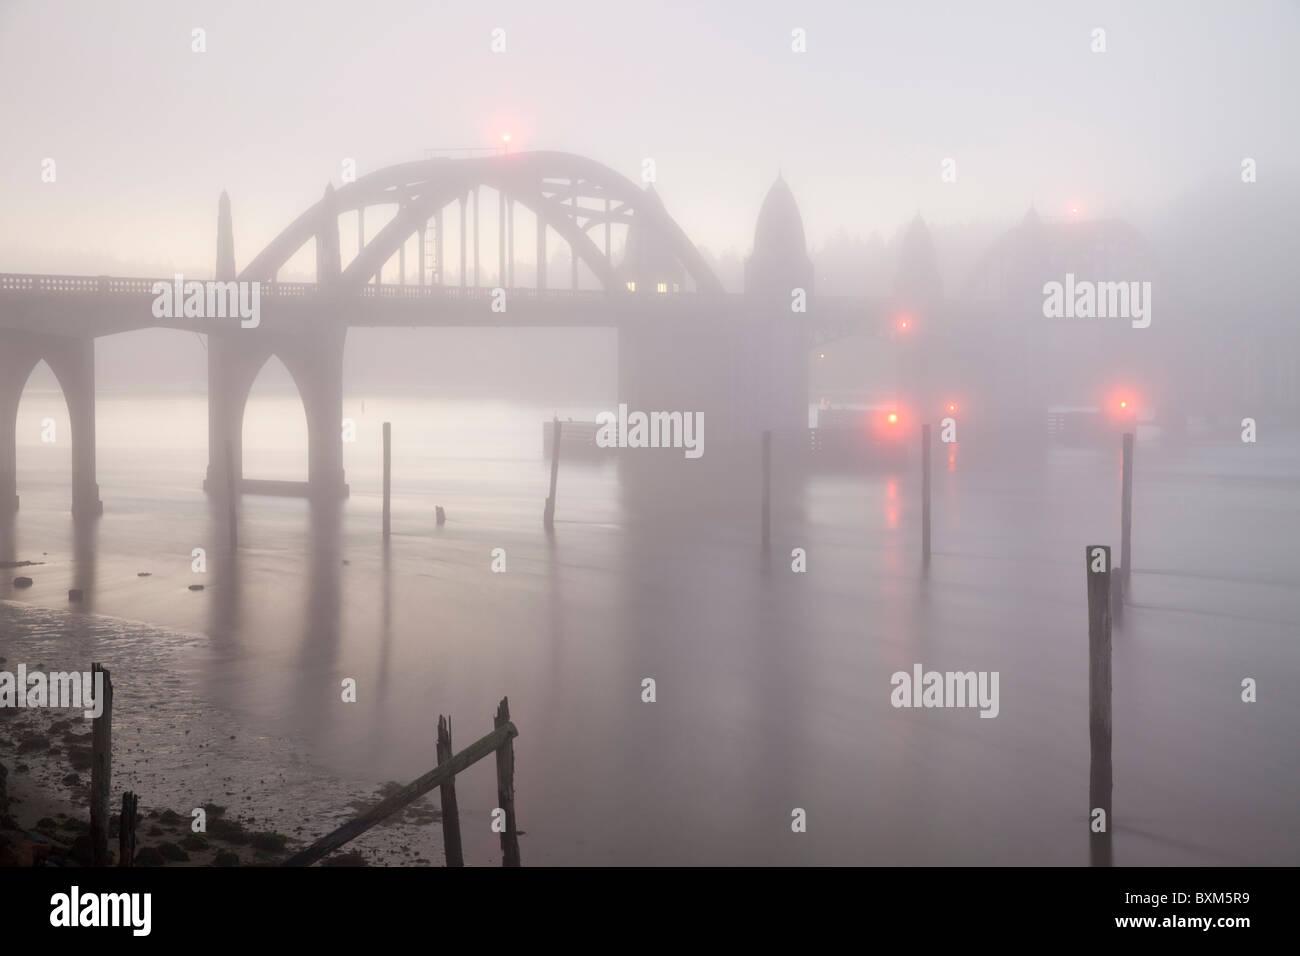 USA; Oregon; Florence; Siuslaw River Bridge, a bascule bridge - Stock Image